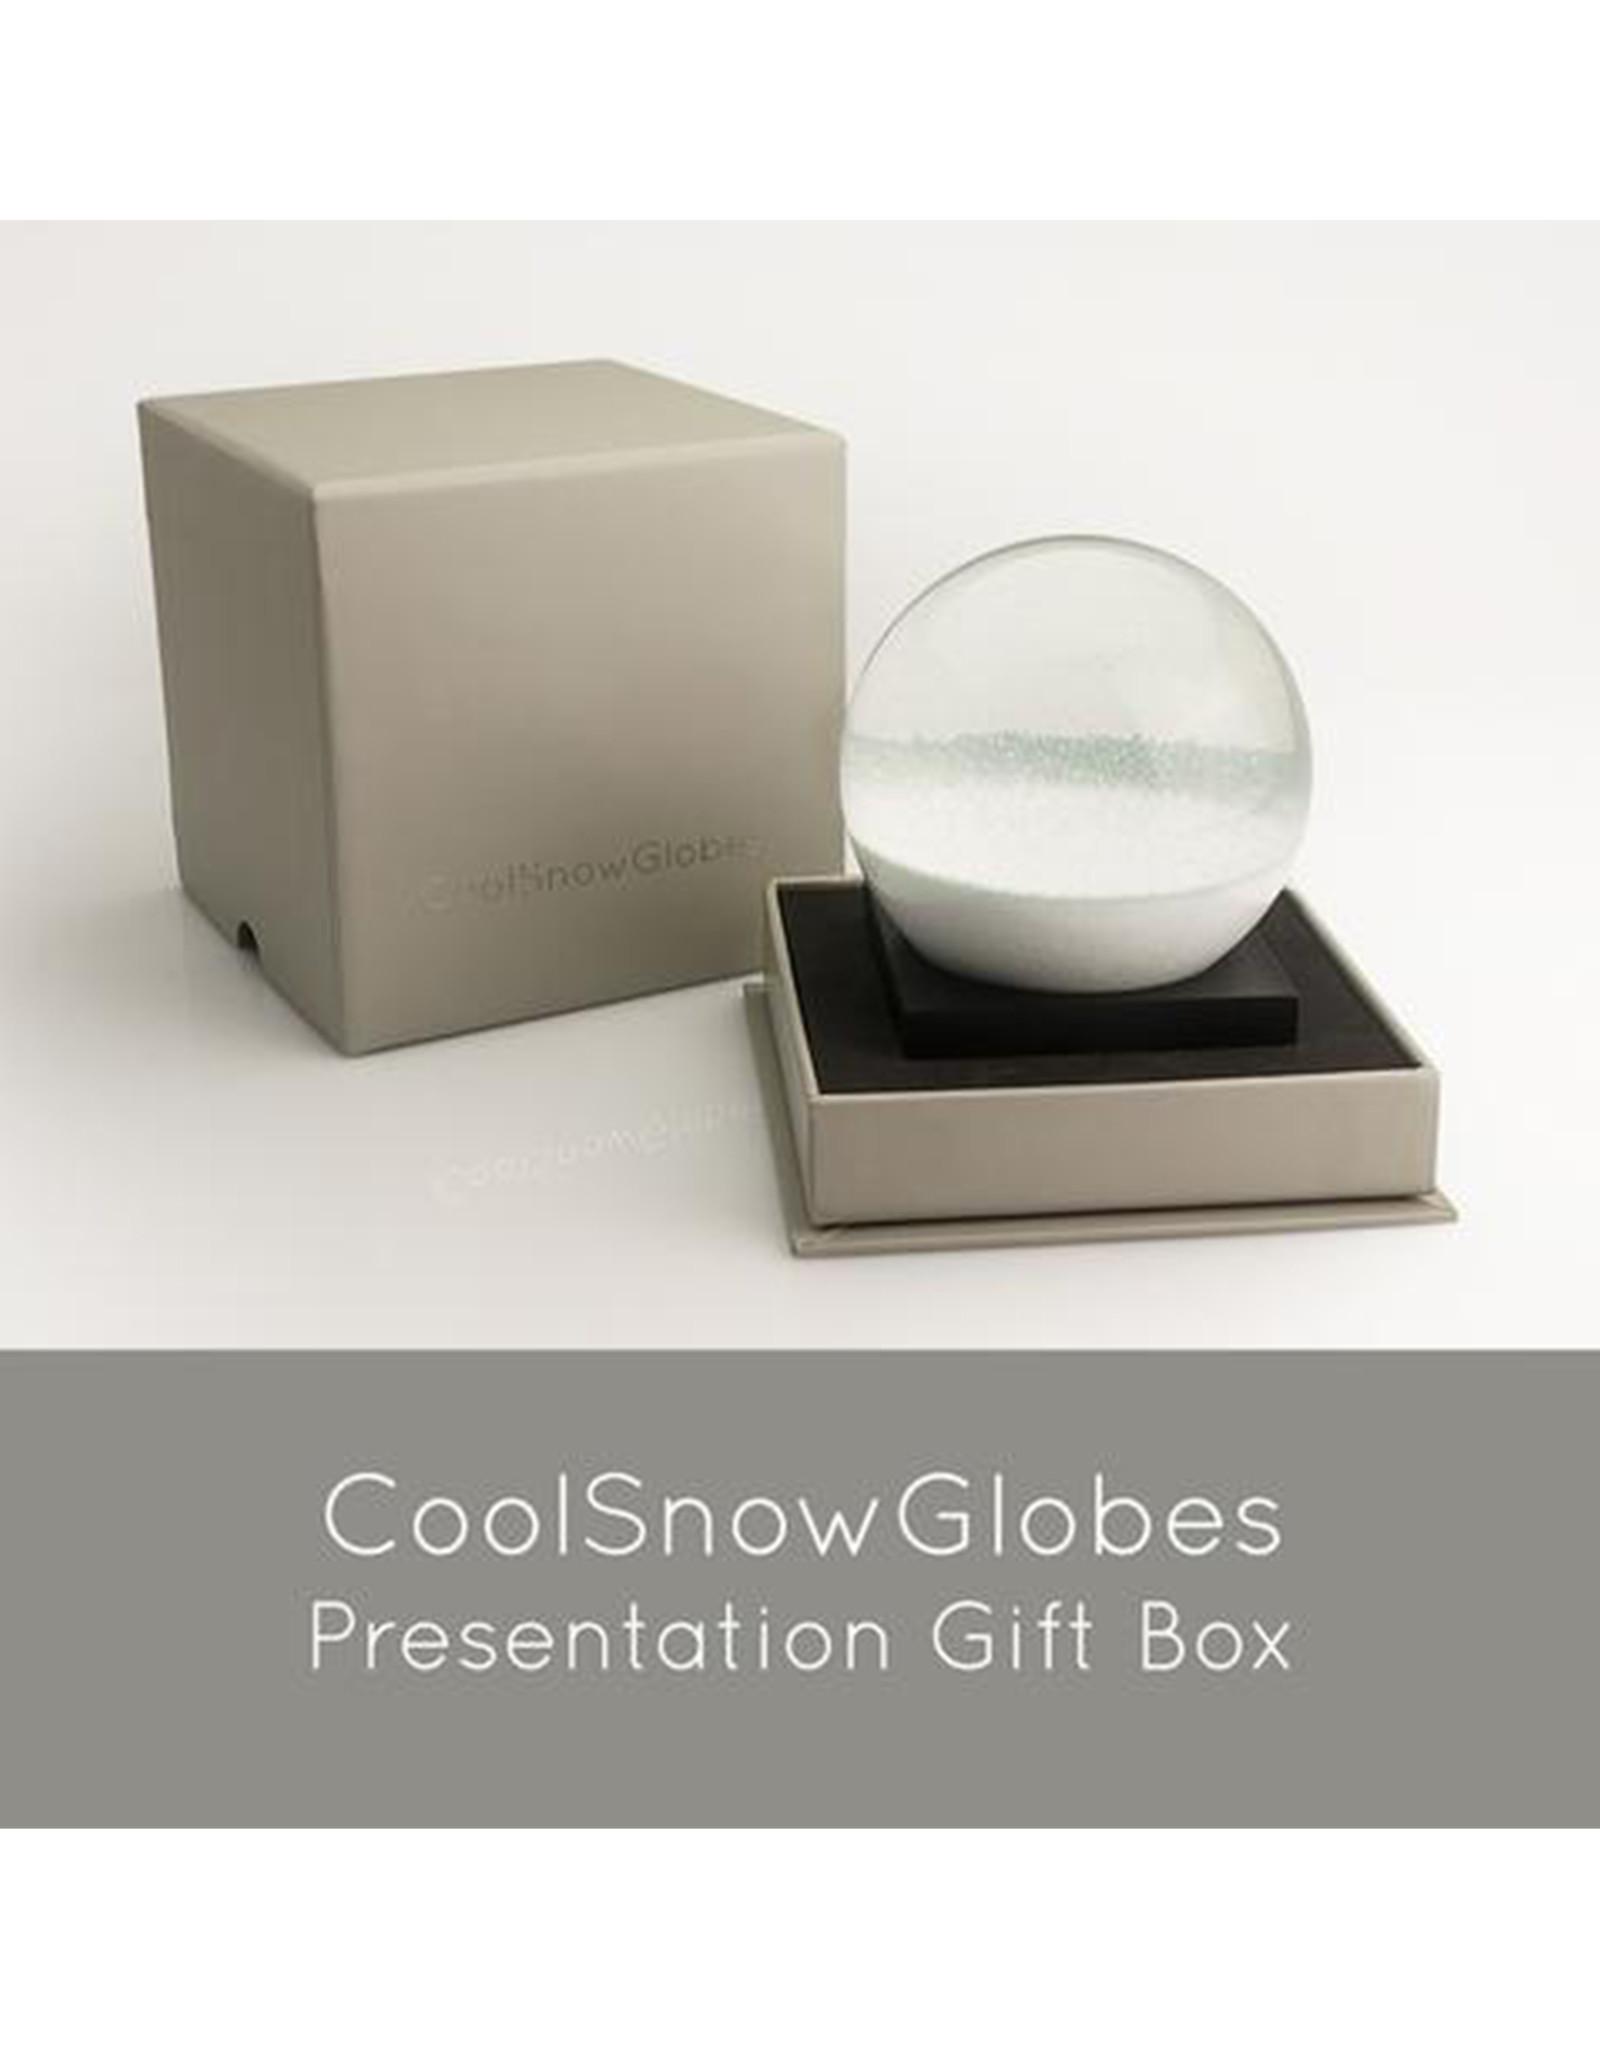 COOL SNOW GLOBES AUTUMN SNOW GLOBE